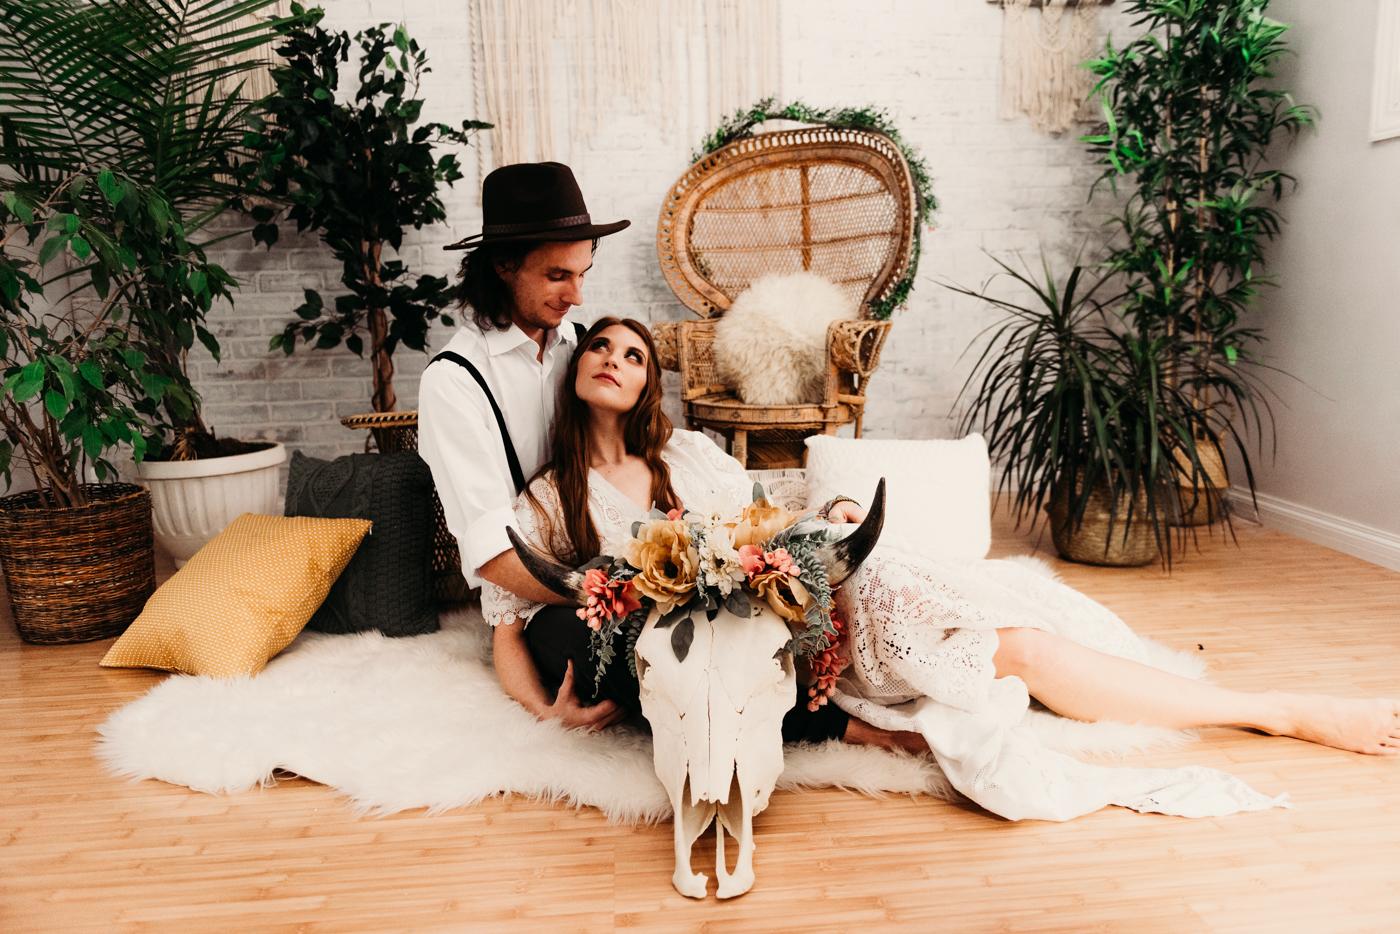 FortSt.John_photographer_TyraEPhotography_Wedding_Couple_Family_Photograhy_DawsonCreek_Elopement_Bride_Boduoir_Portraits-4796-2.jpg